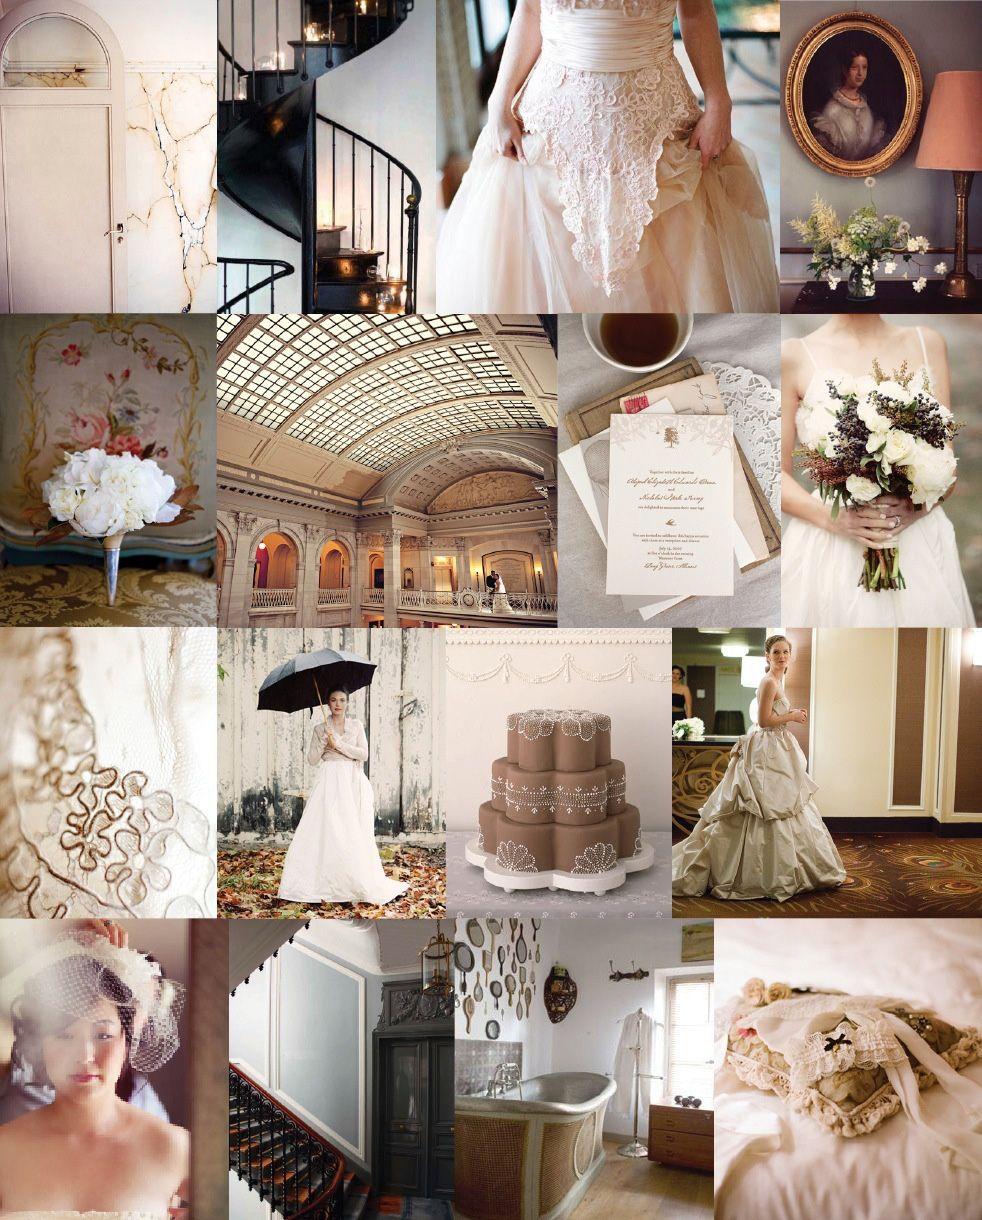 Some Superb Summer Wedding Theme Ideas